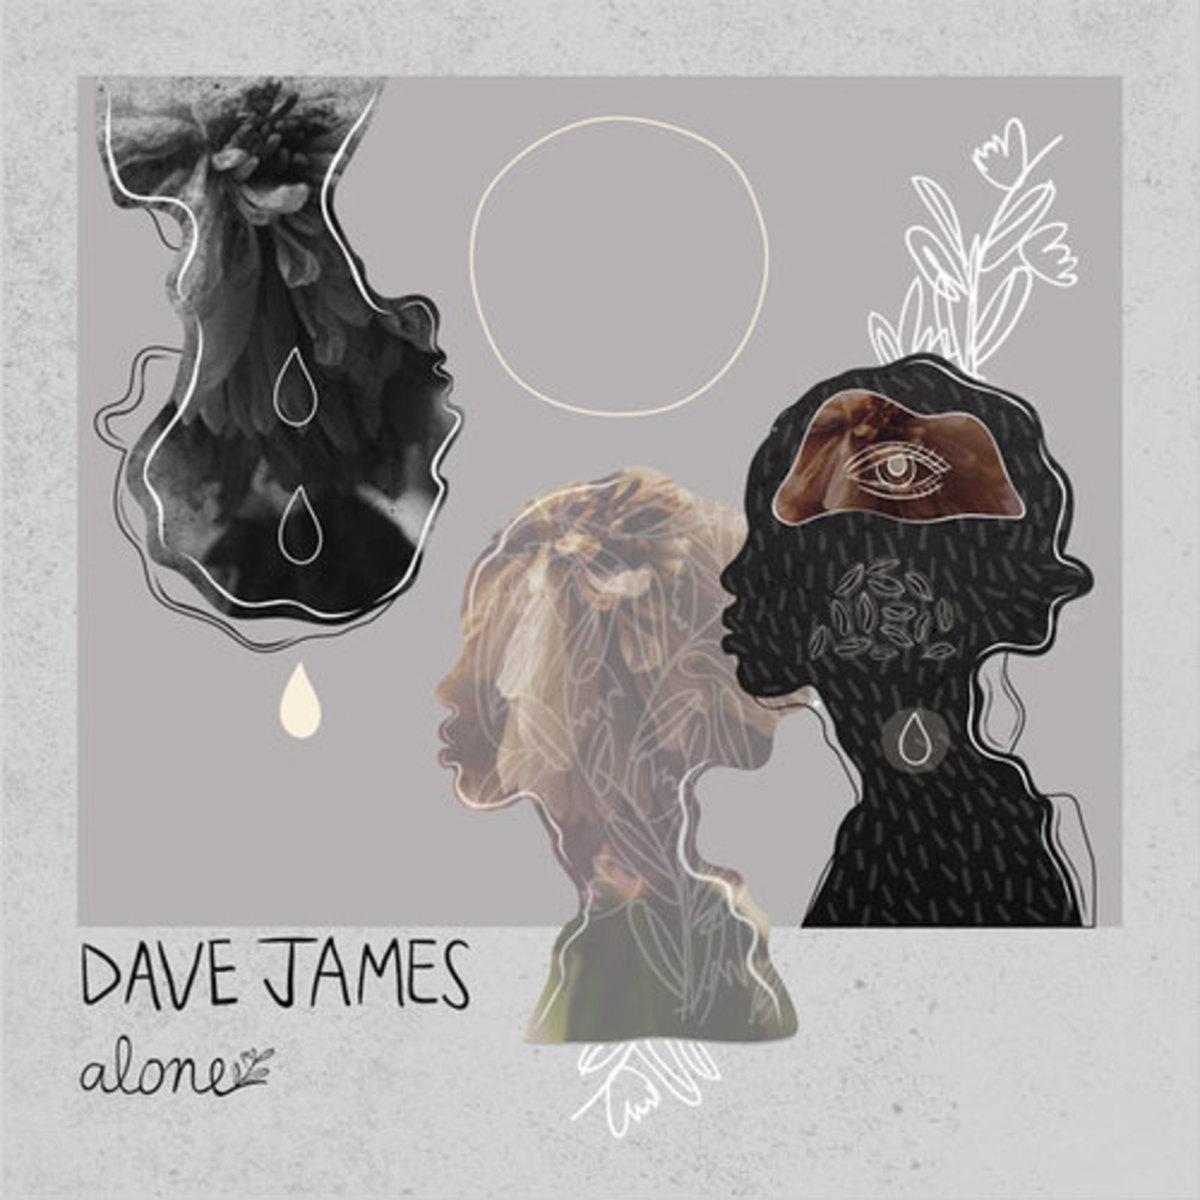 dave-james-alone.jpg